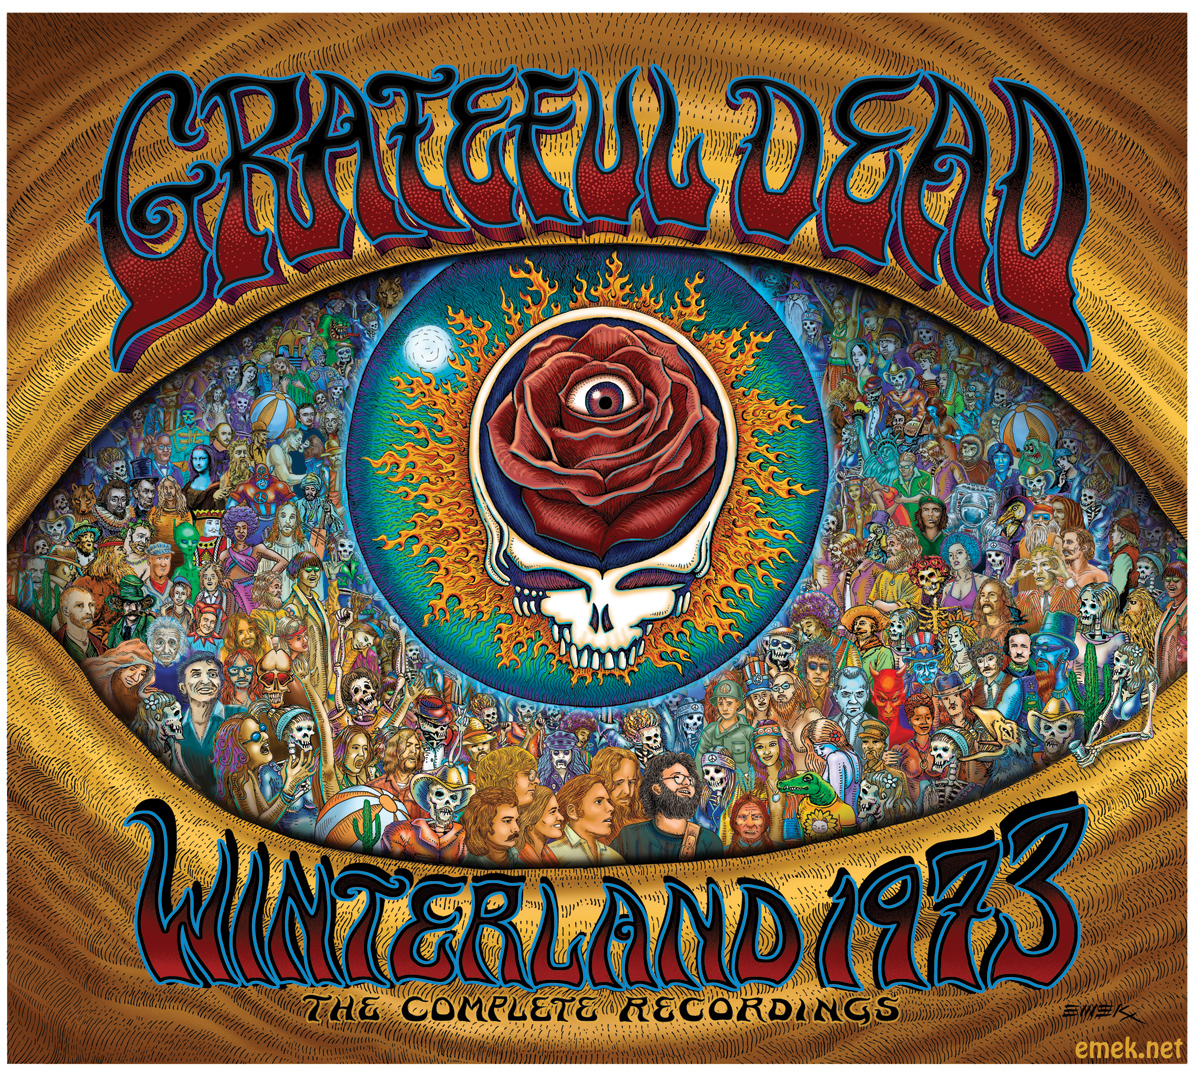 Group Of Dead Set Grateful Dead Wallpaper